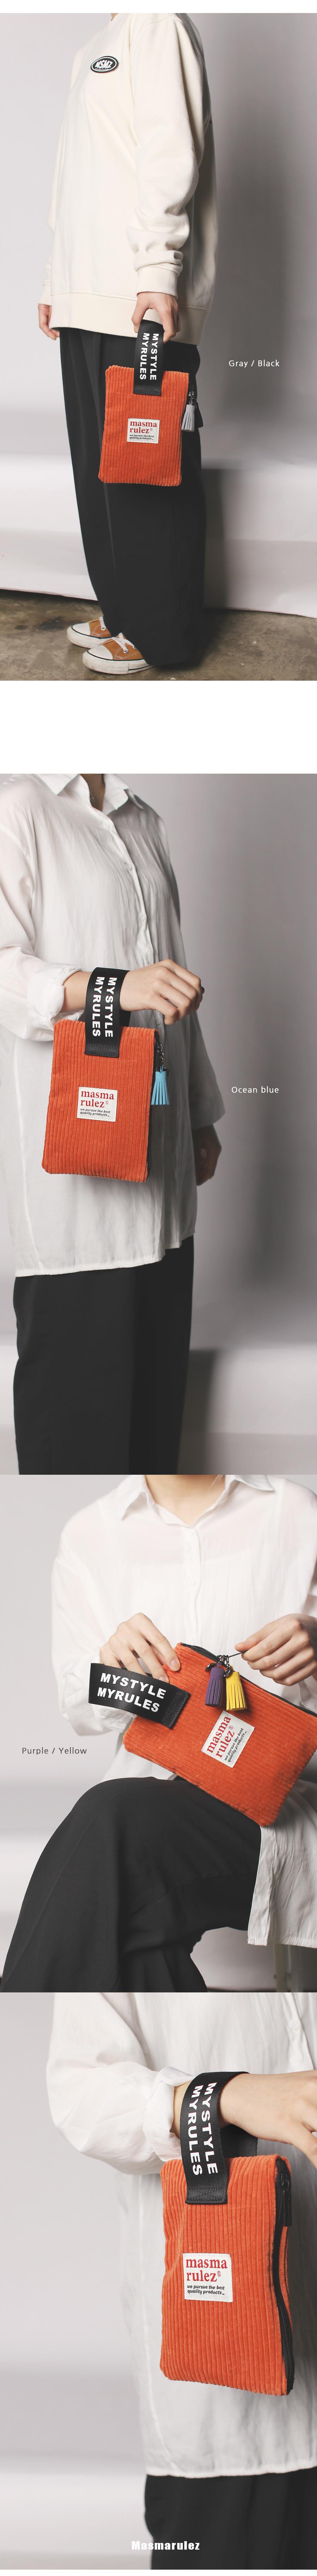 corduroy-orange-d-3.jpg